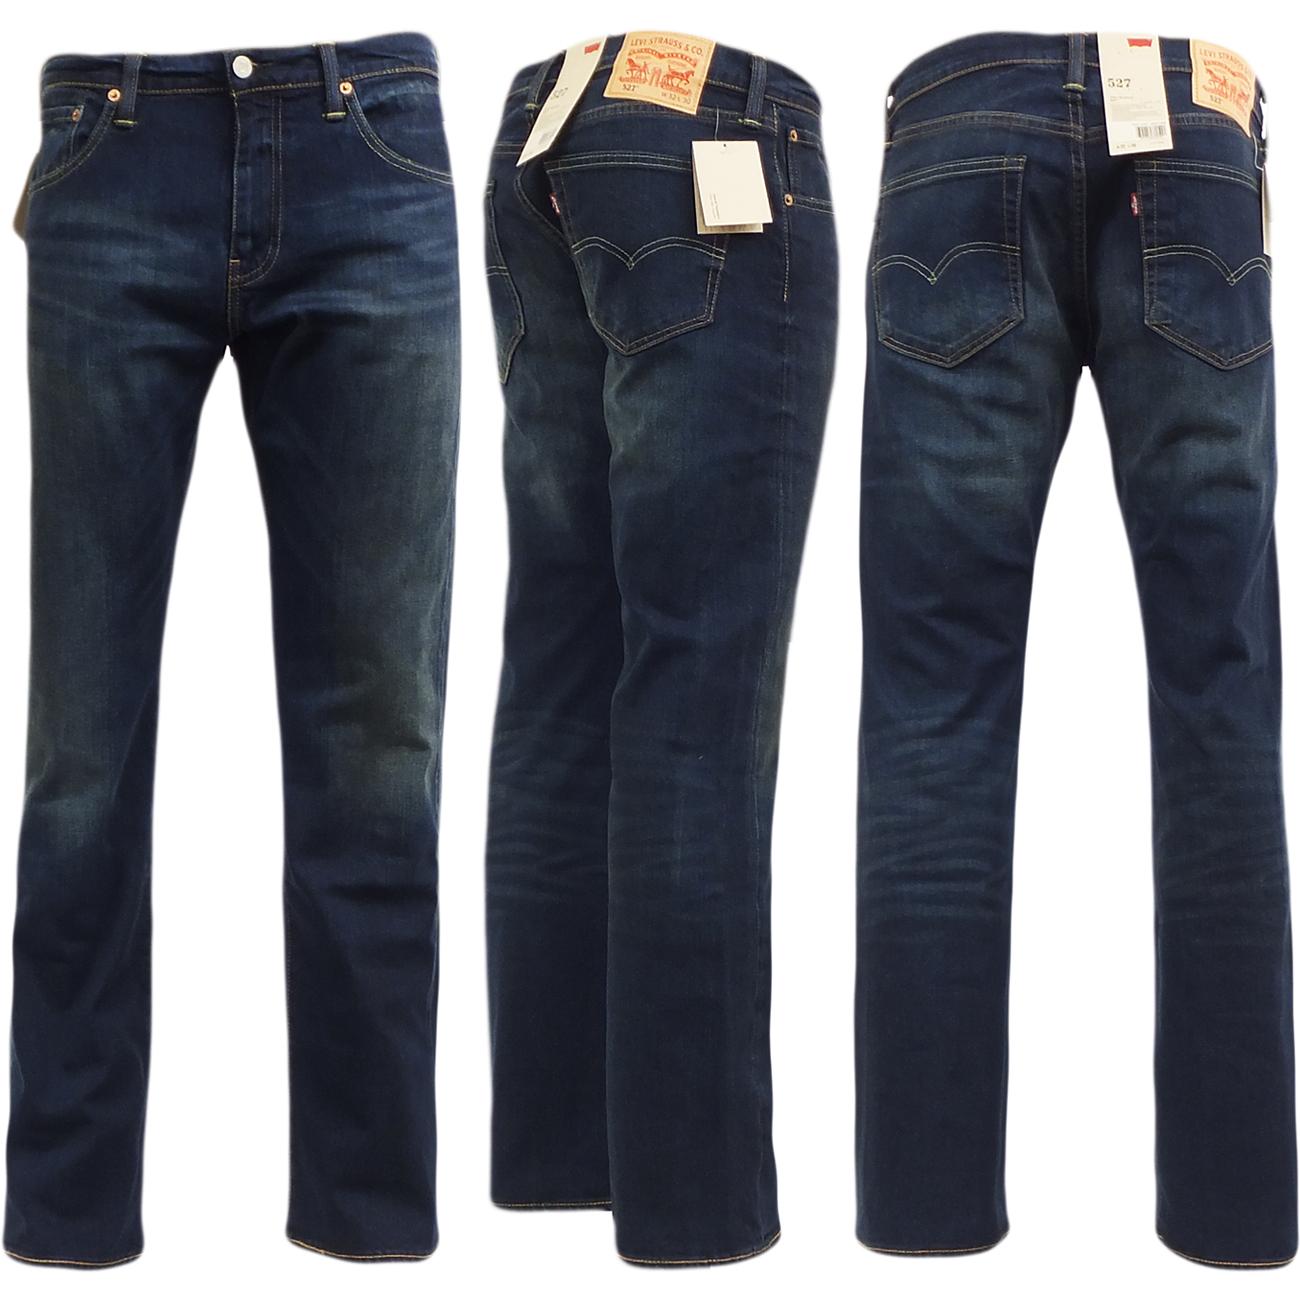 levi strauss jean 527 green edge bootcut jeans mr h. Black Bedroom Furniture Sets. Home Design Ideas